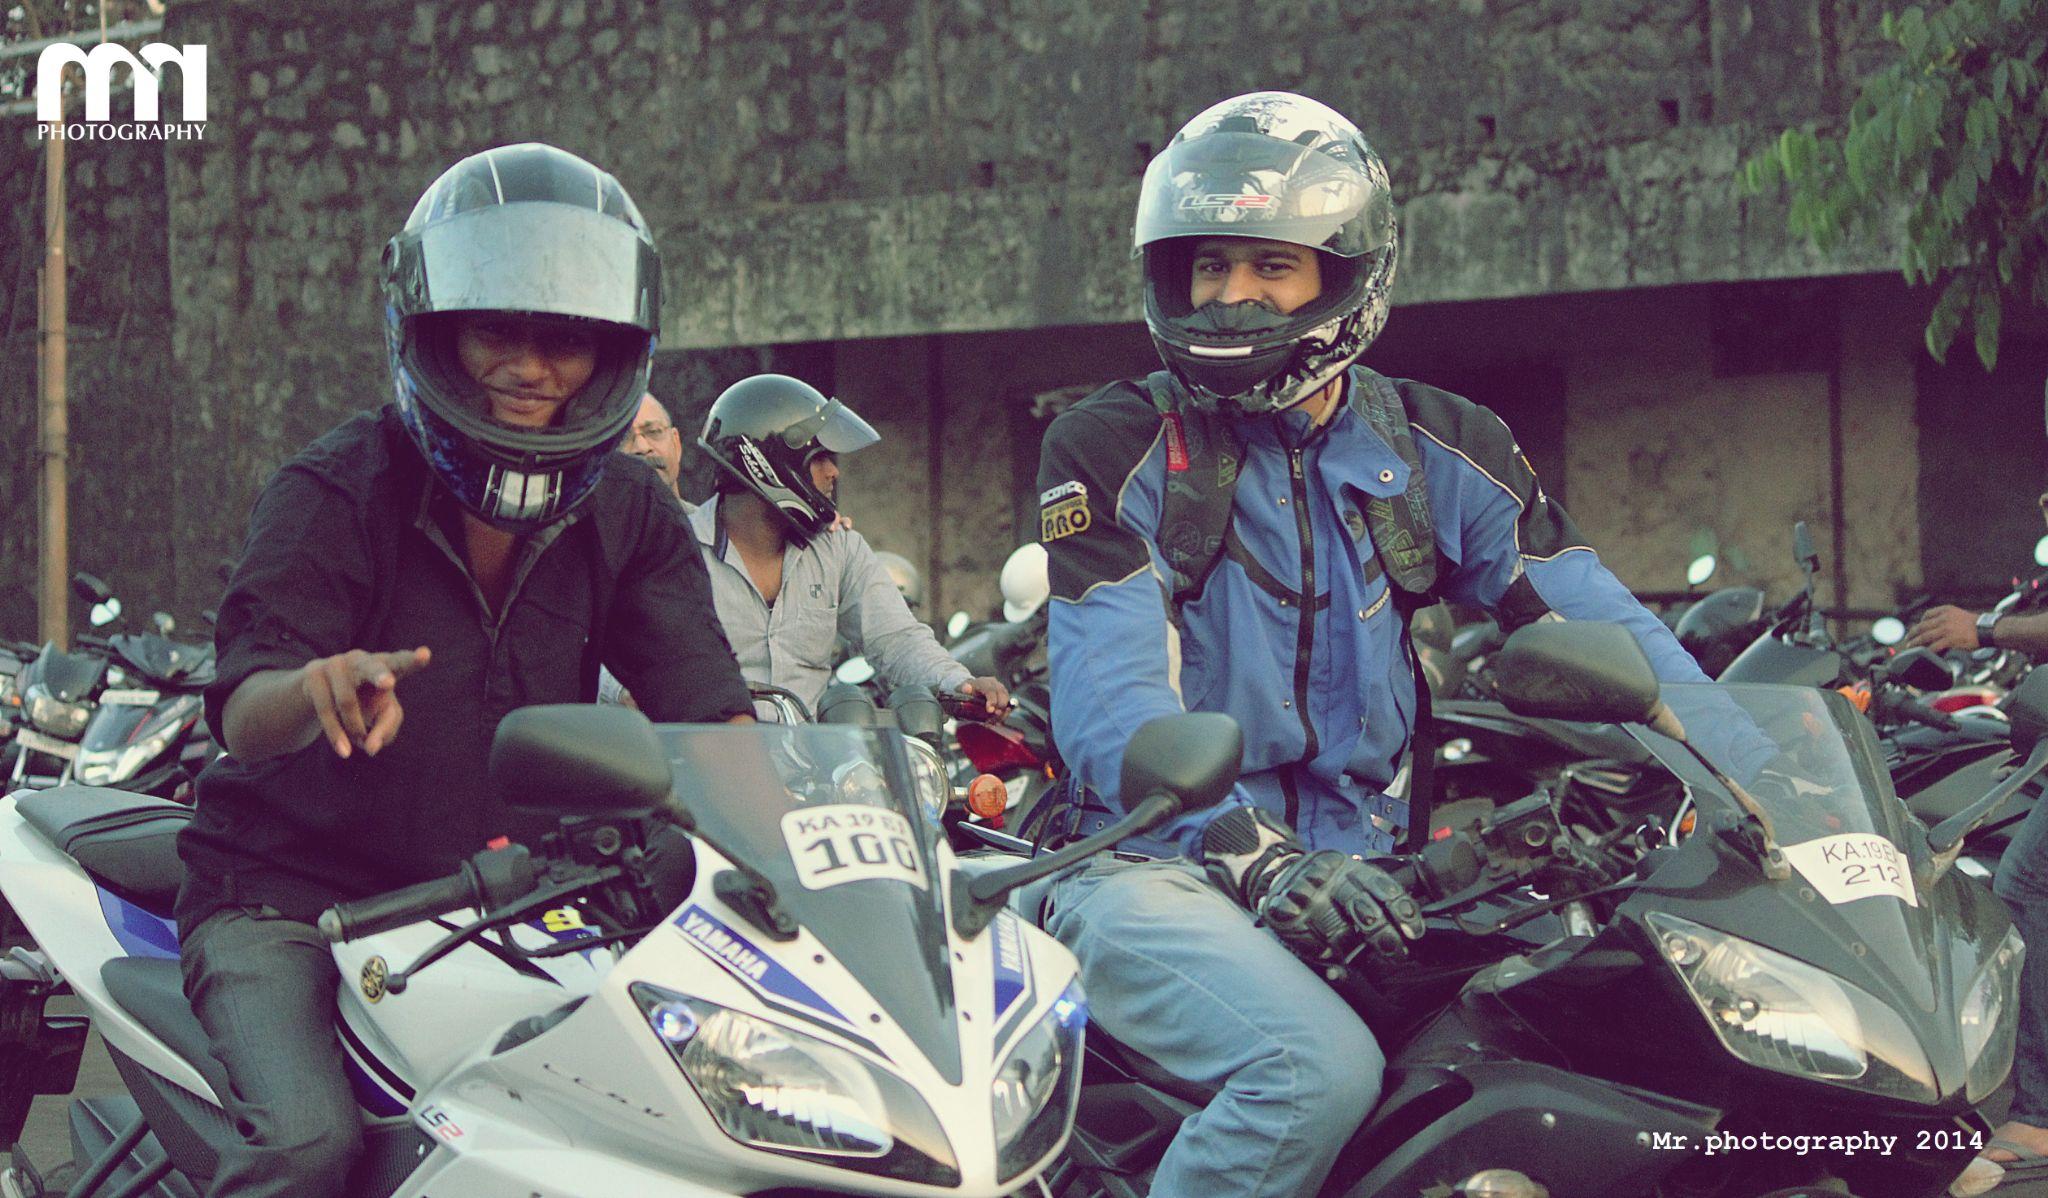 WORLD MOTORCYCLE DAY by sanadrahman (Mr.photography mangalore)